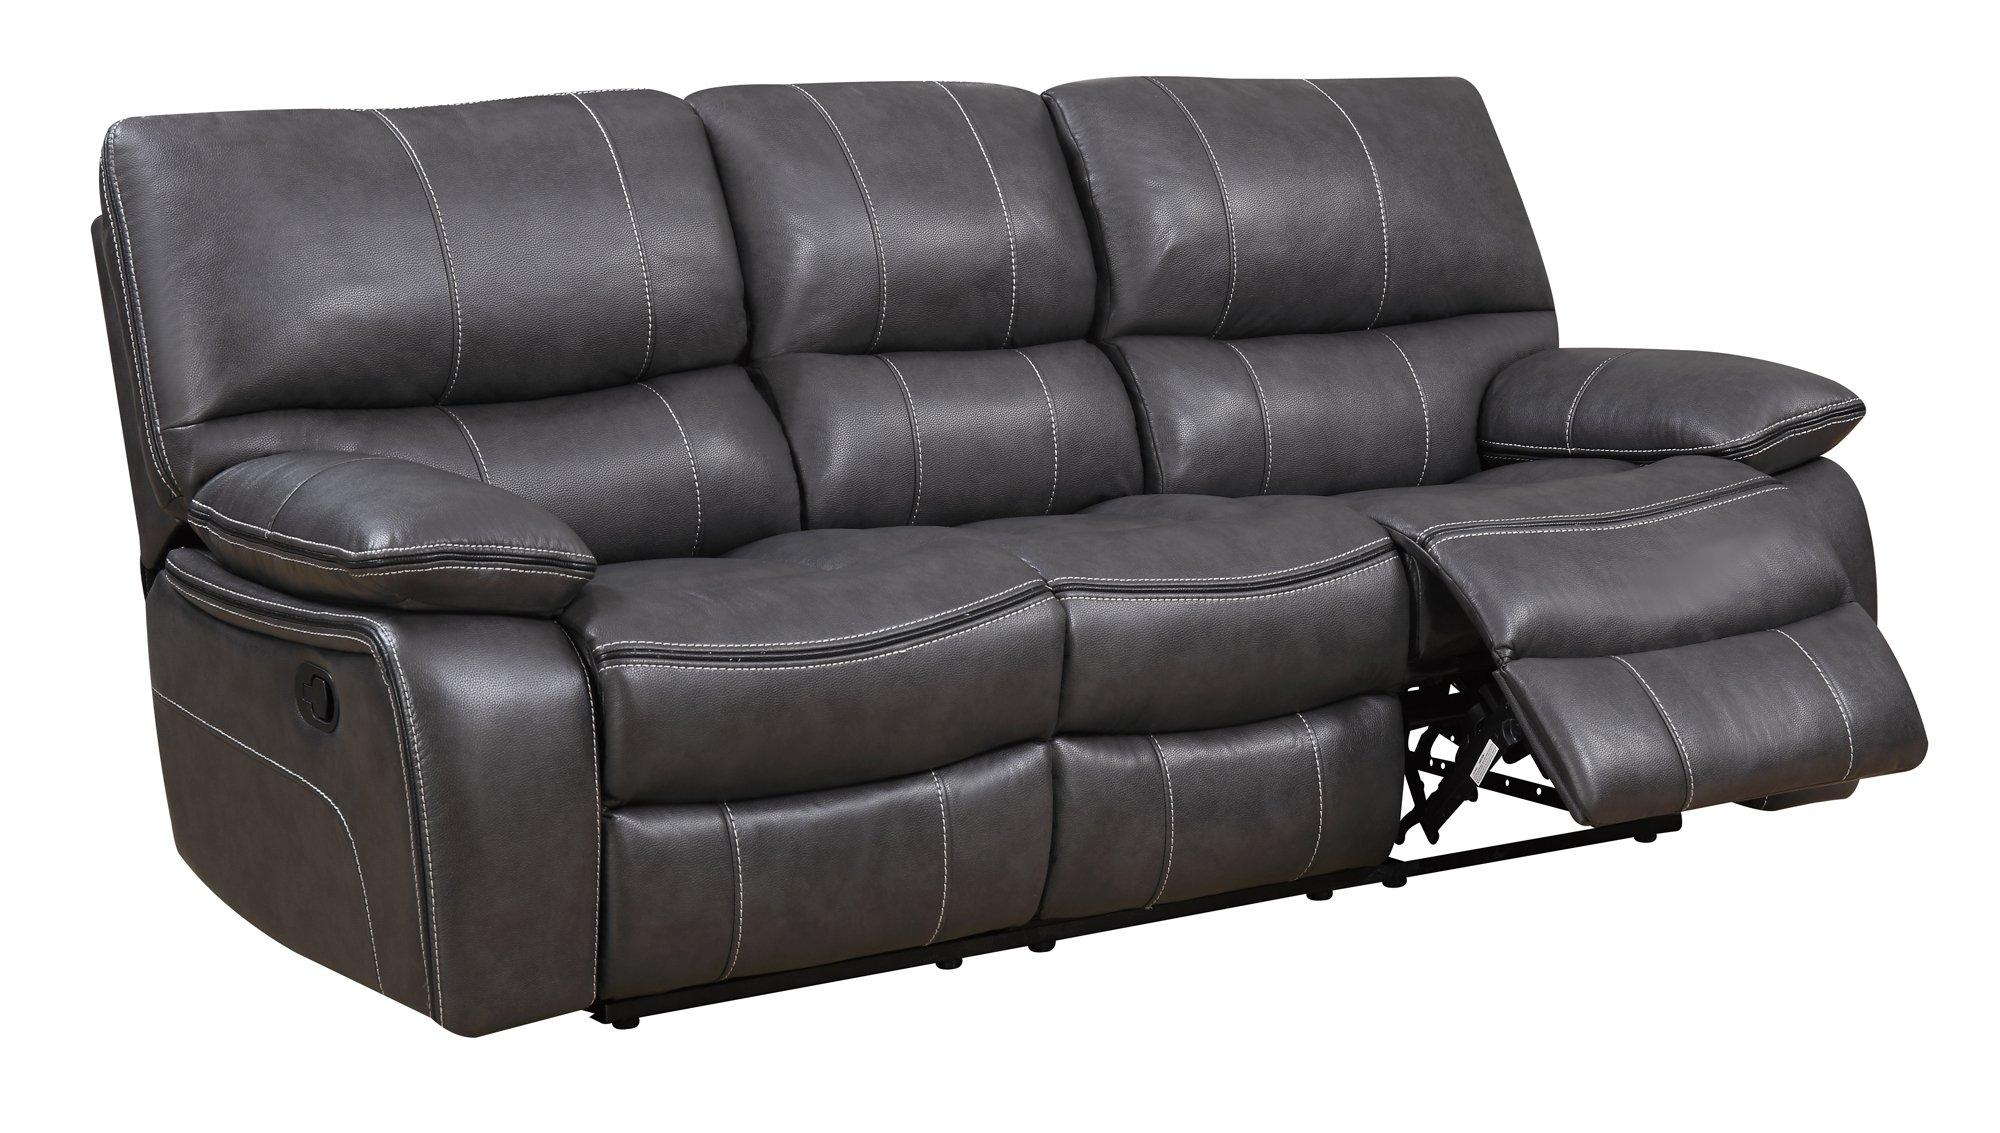 U0040 Grey/Black Leather Air Reclining Sofa by Global Furniture